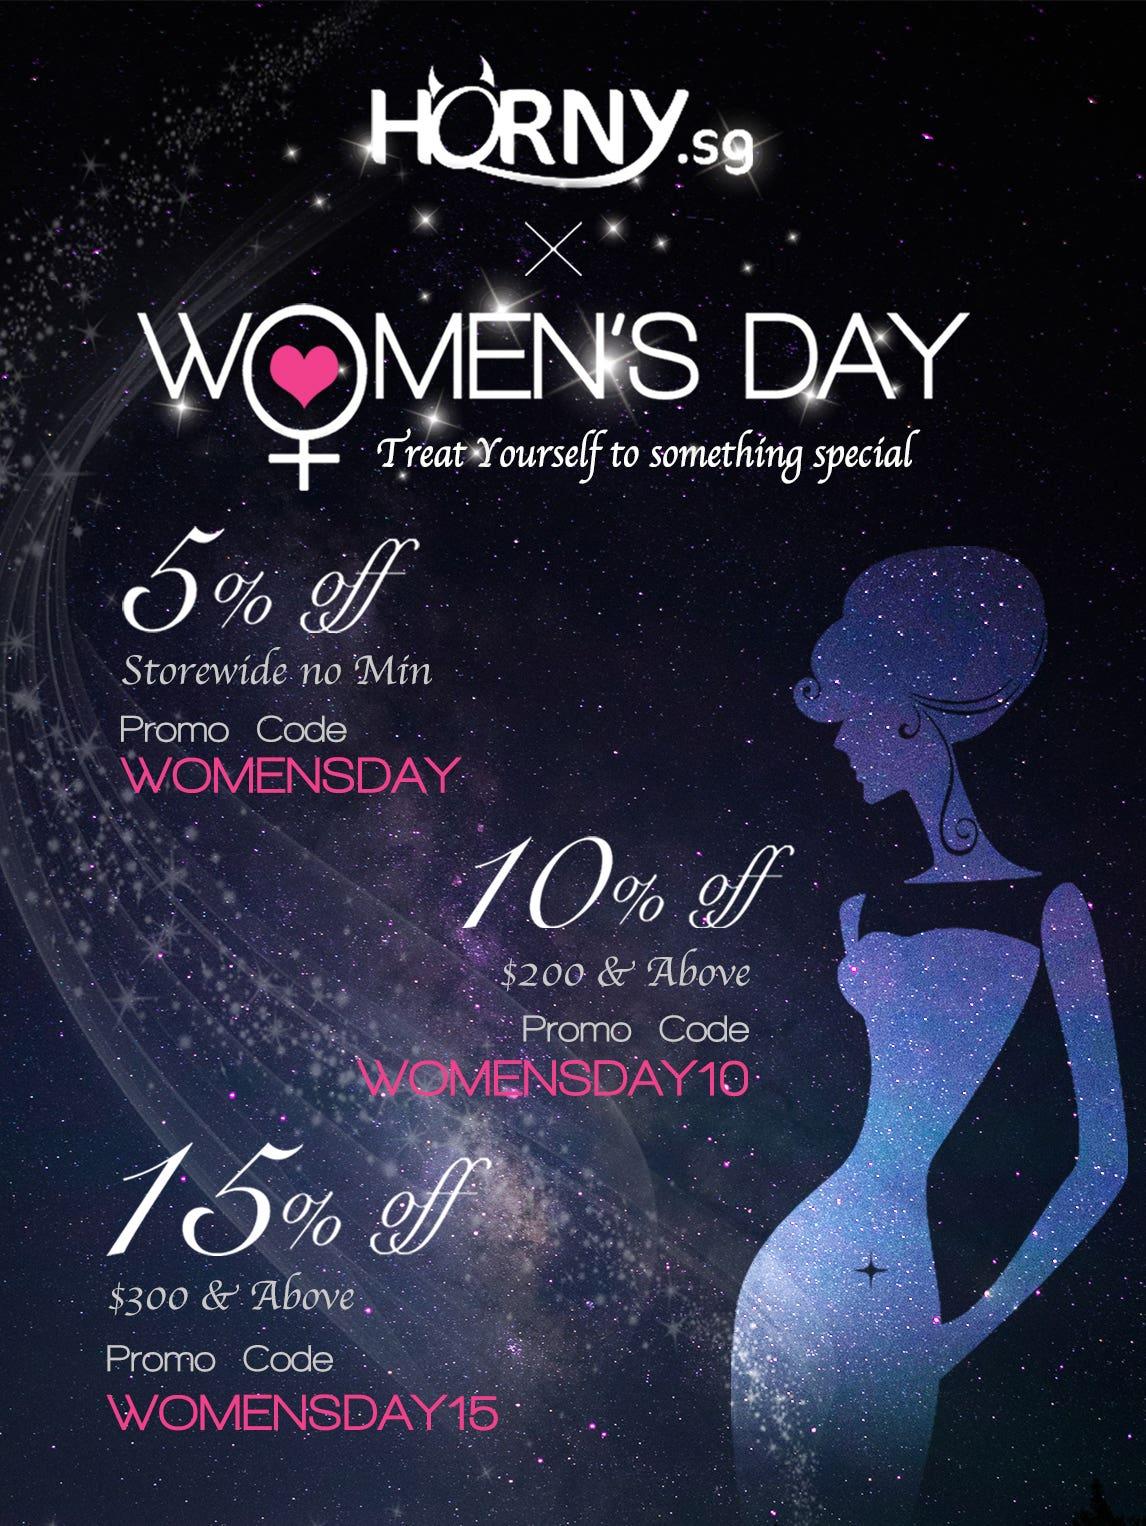 Women's Day - 5% Off No Minimum!